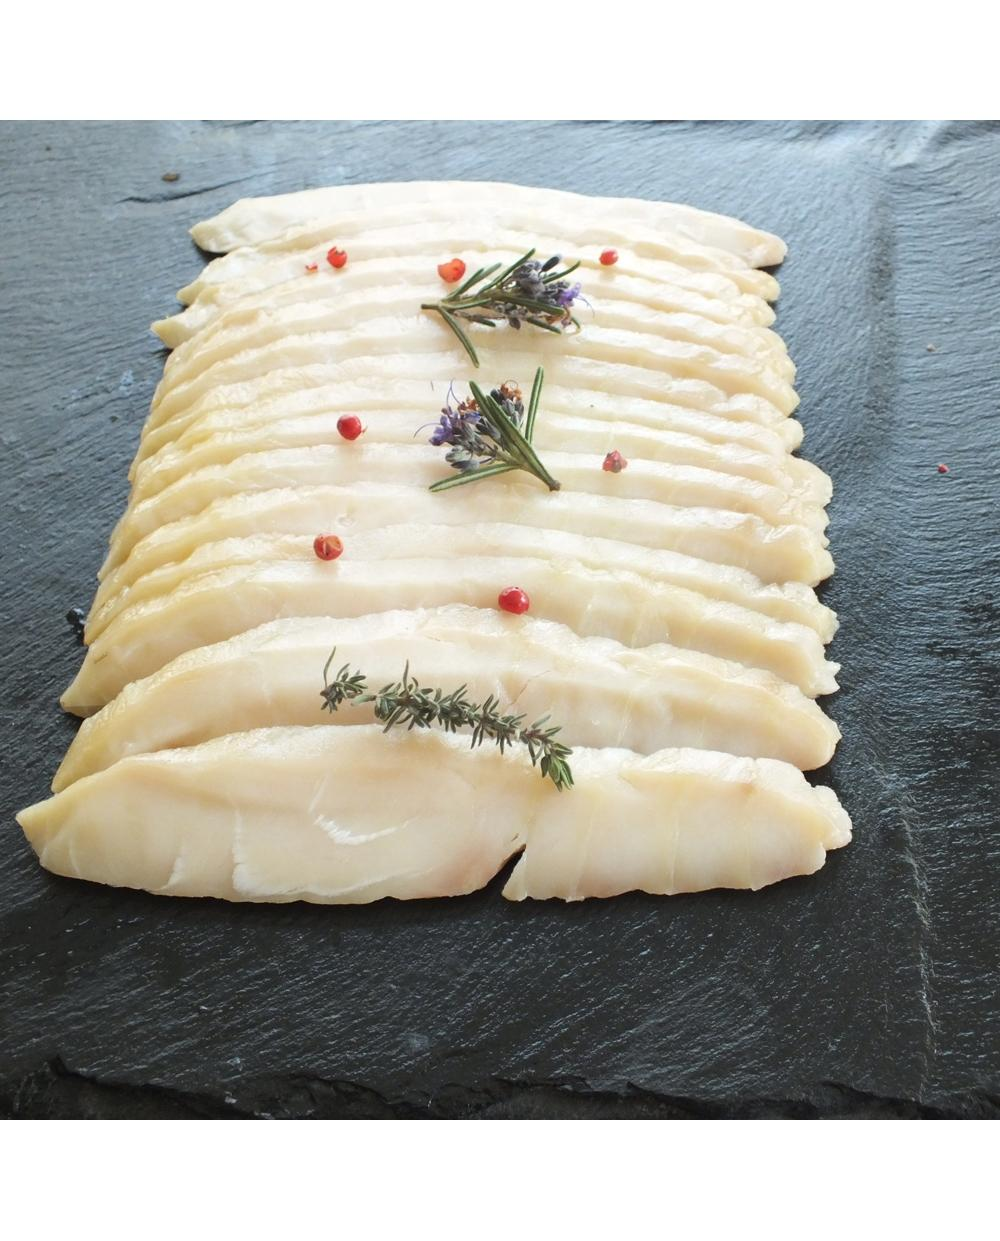 Esturgeon fumee sans peau tranchees facon sashimi 200g